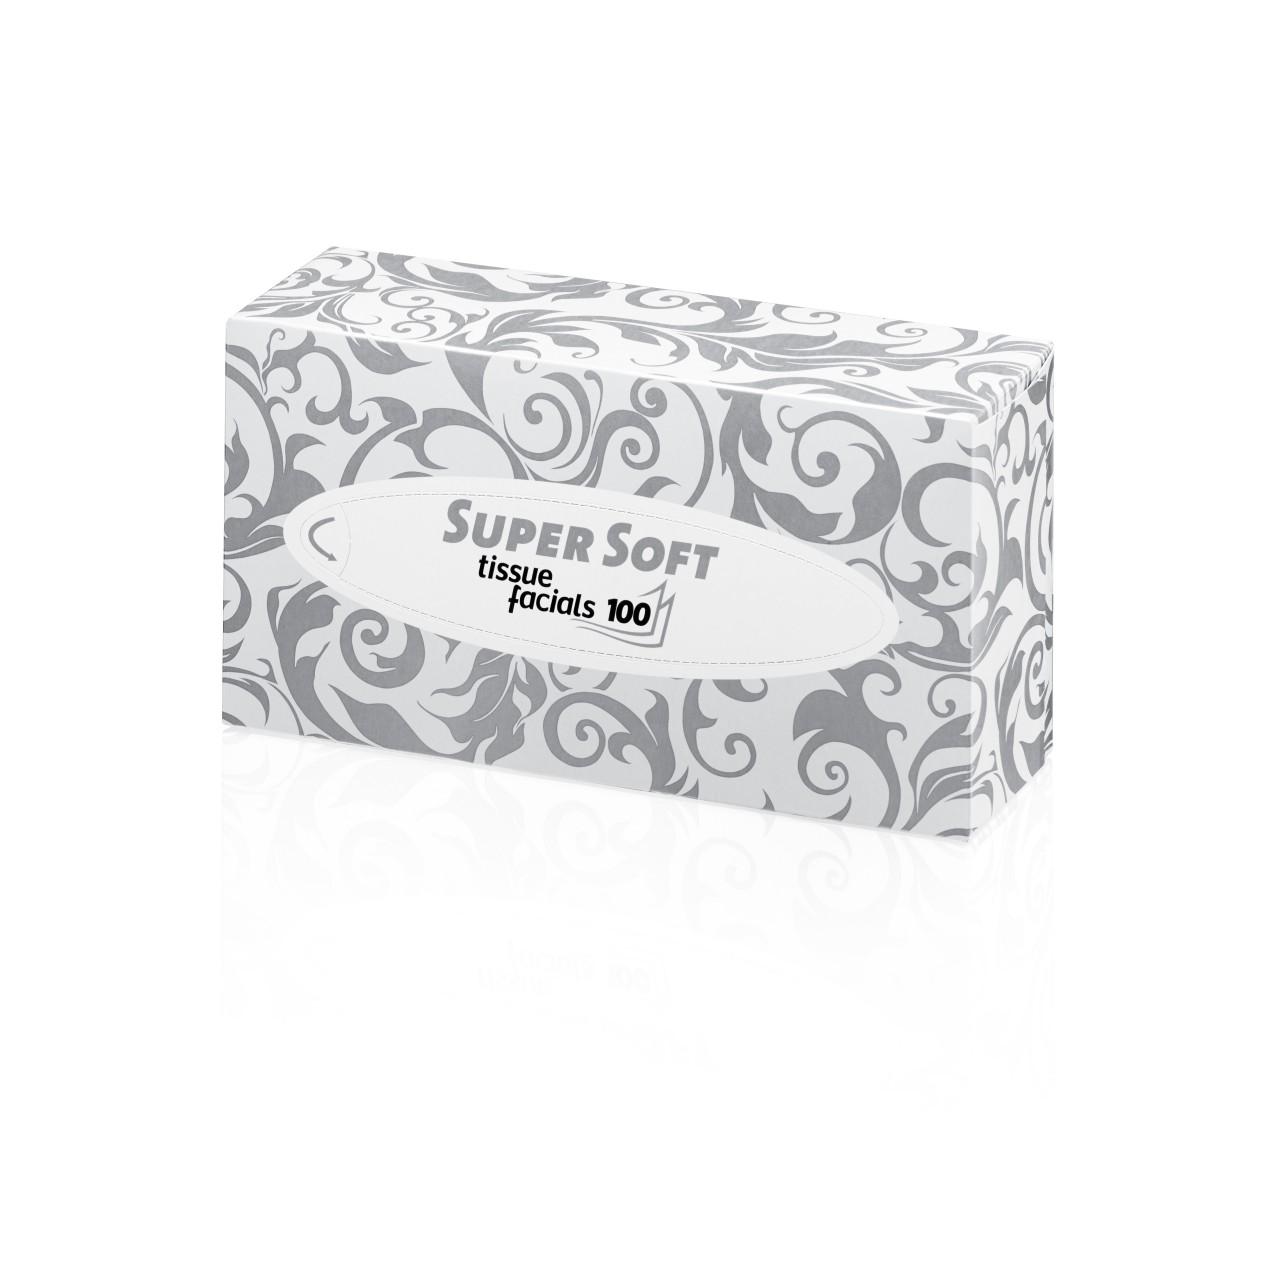 Kosmetiktücher Super Soft 100Blatt-/2-lagig